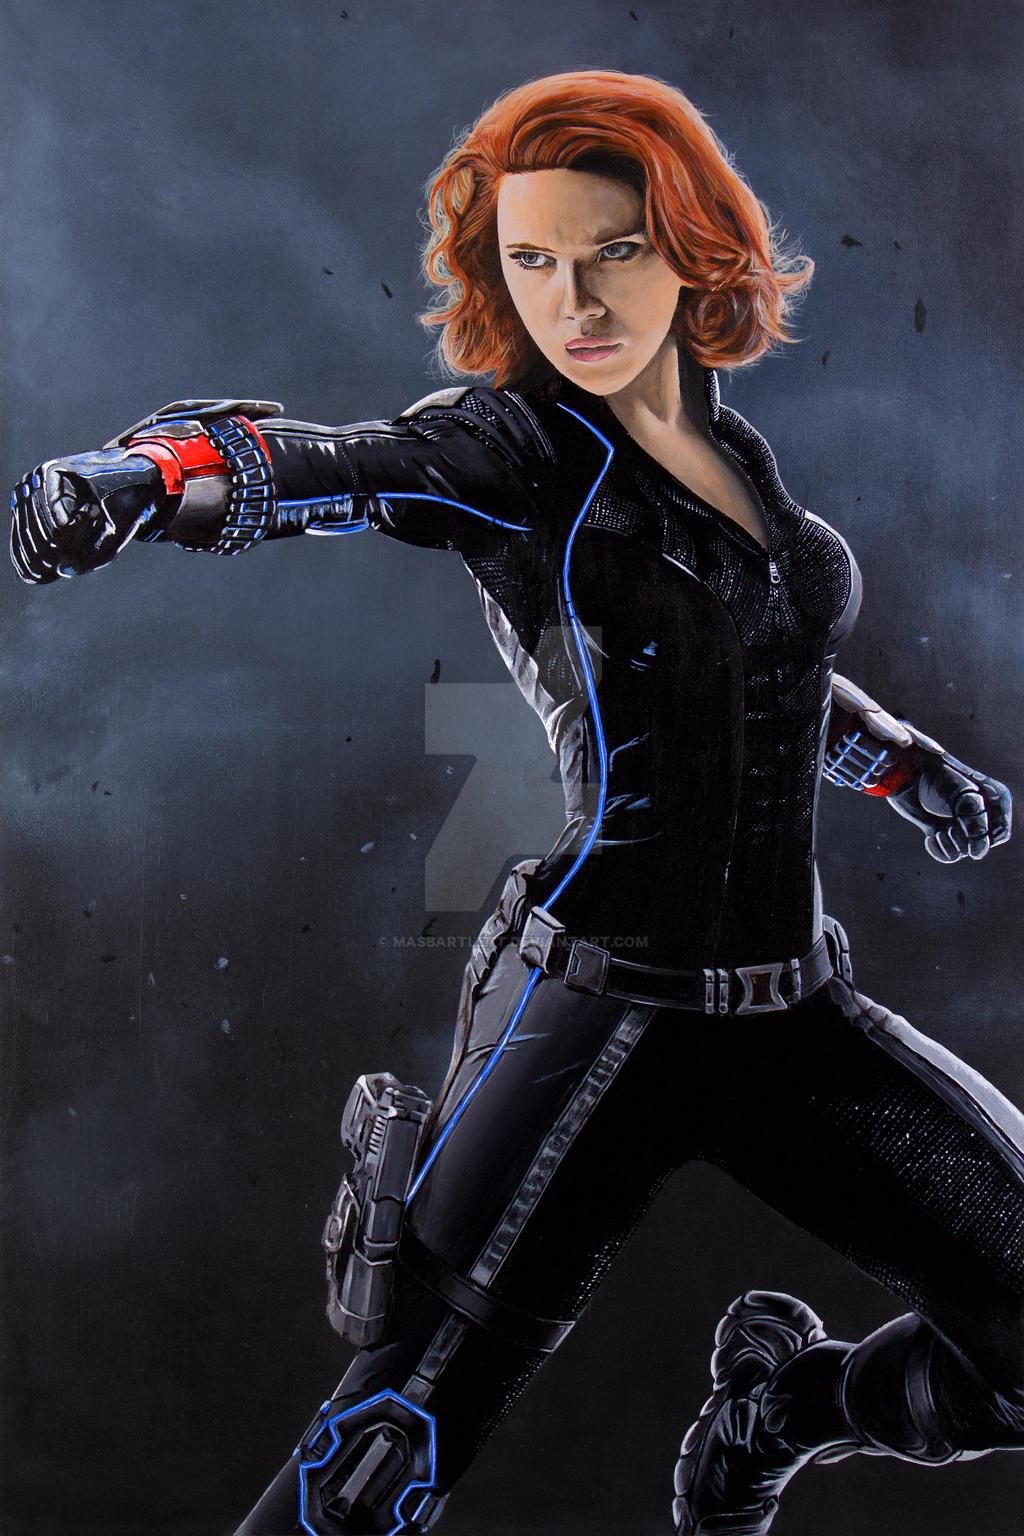 Black Widow By Masbartlett On Deviantart-5203